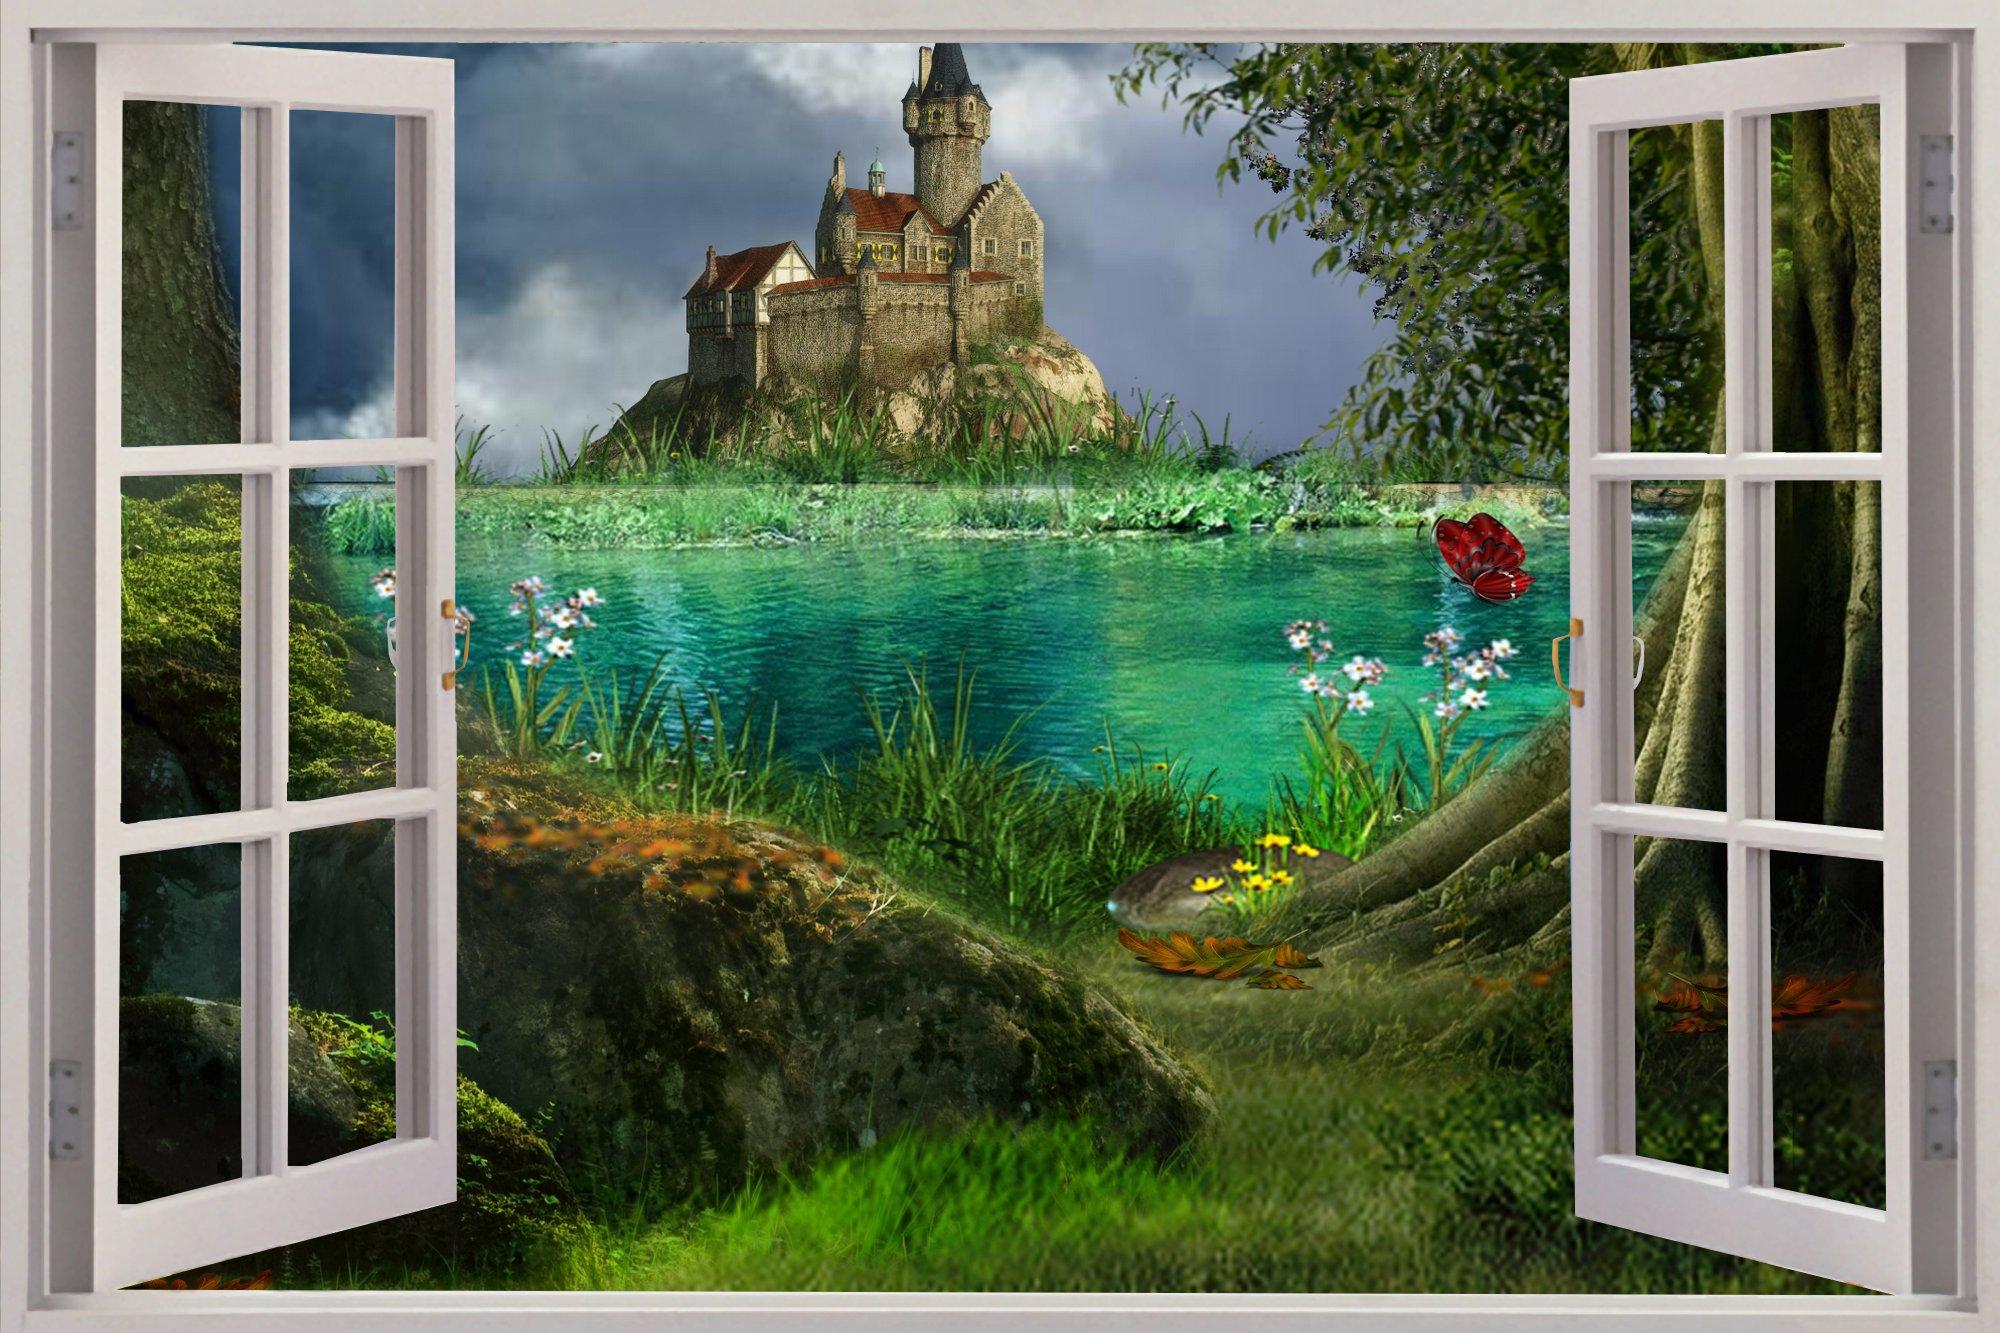 ebay 3d wallpaper wallpapersafari details about huge 3d window enchanted castle view wall stickers mural